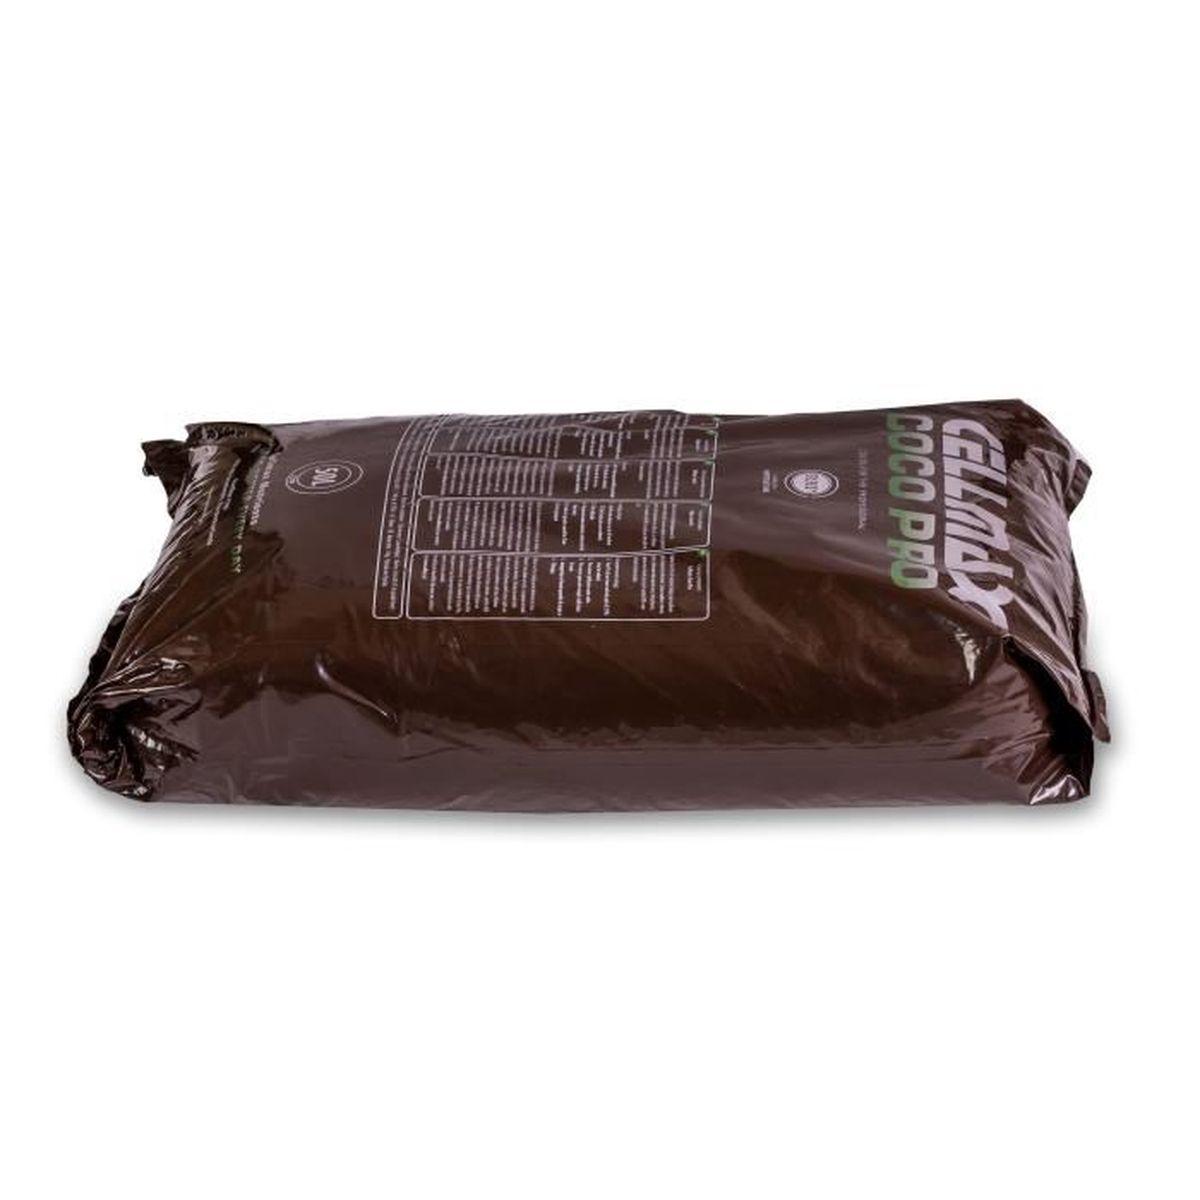 Paillis Noix De Coco cellmax fibre de coco - achat / vente terreau - sable